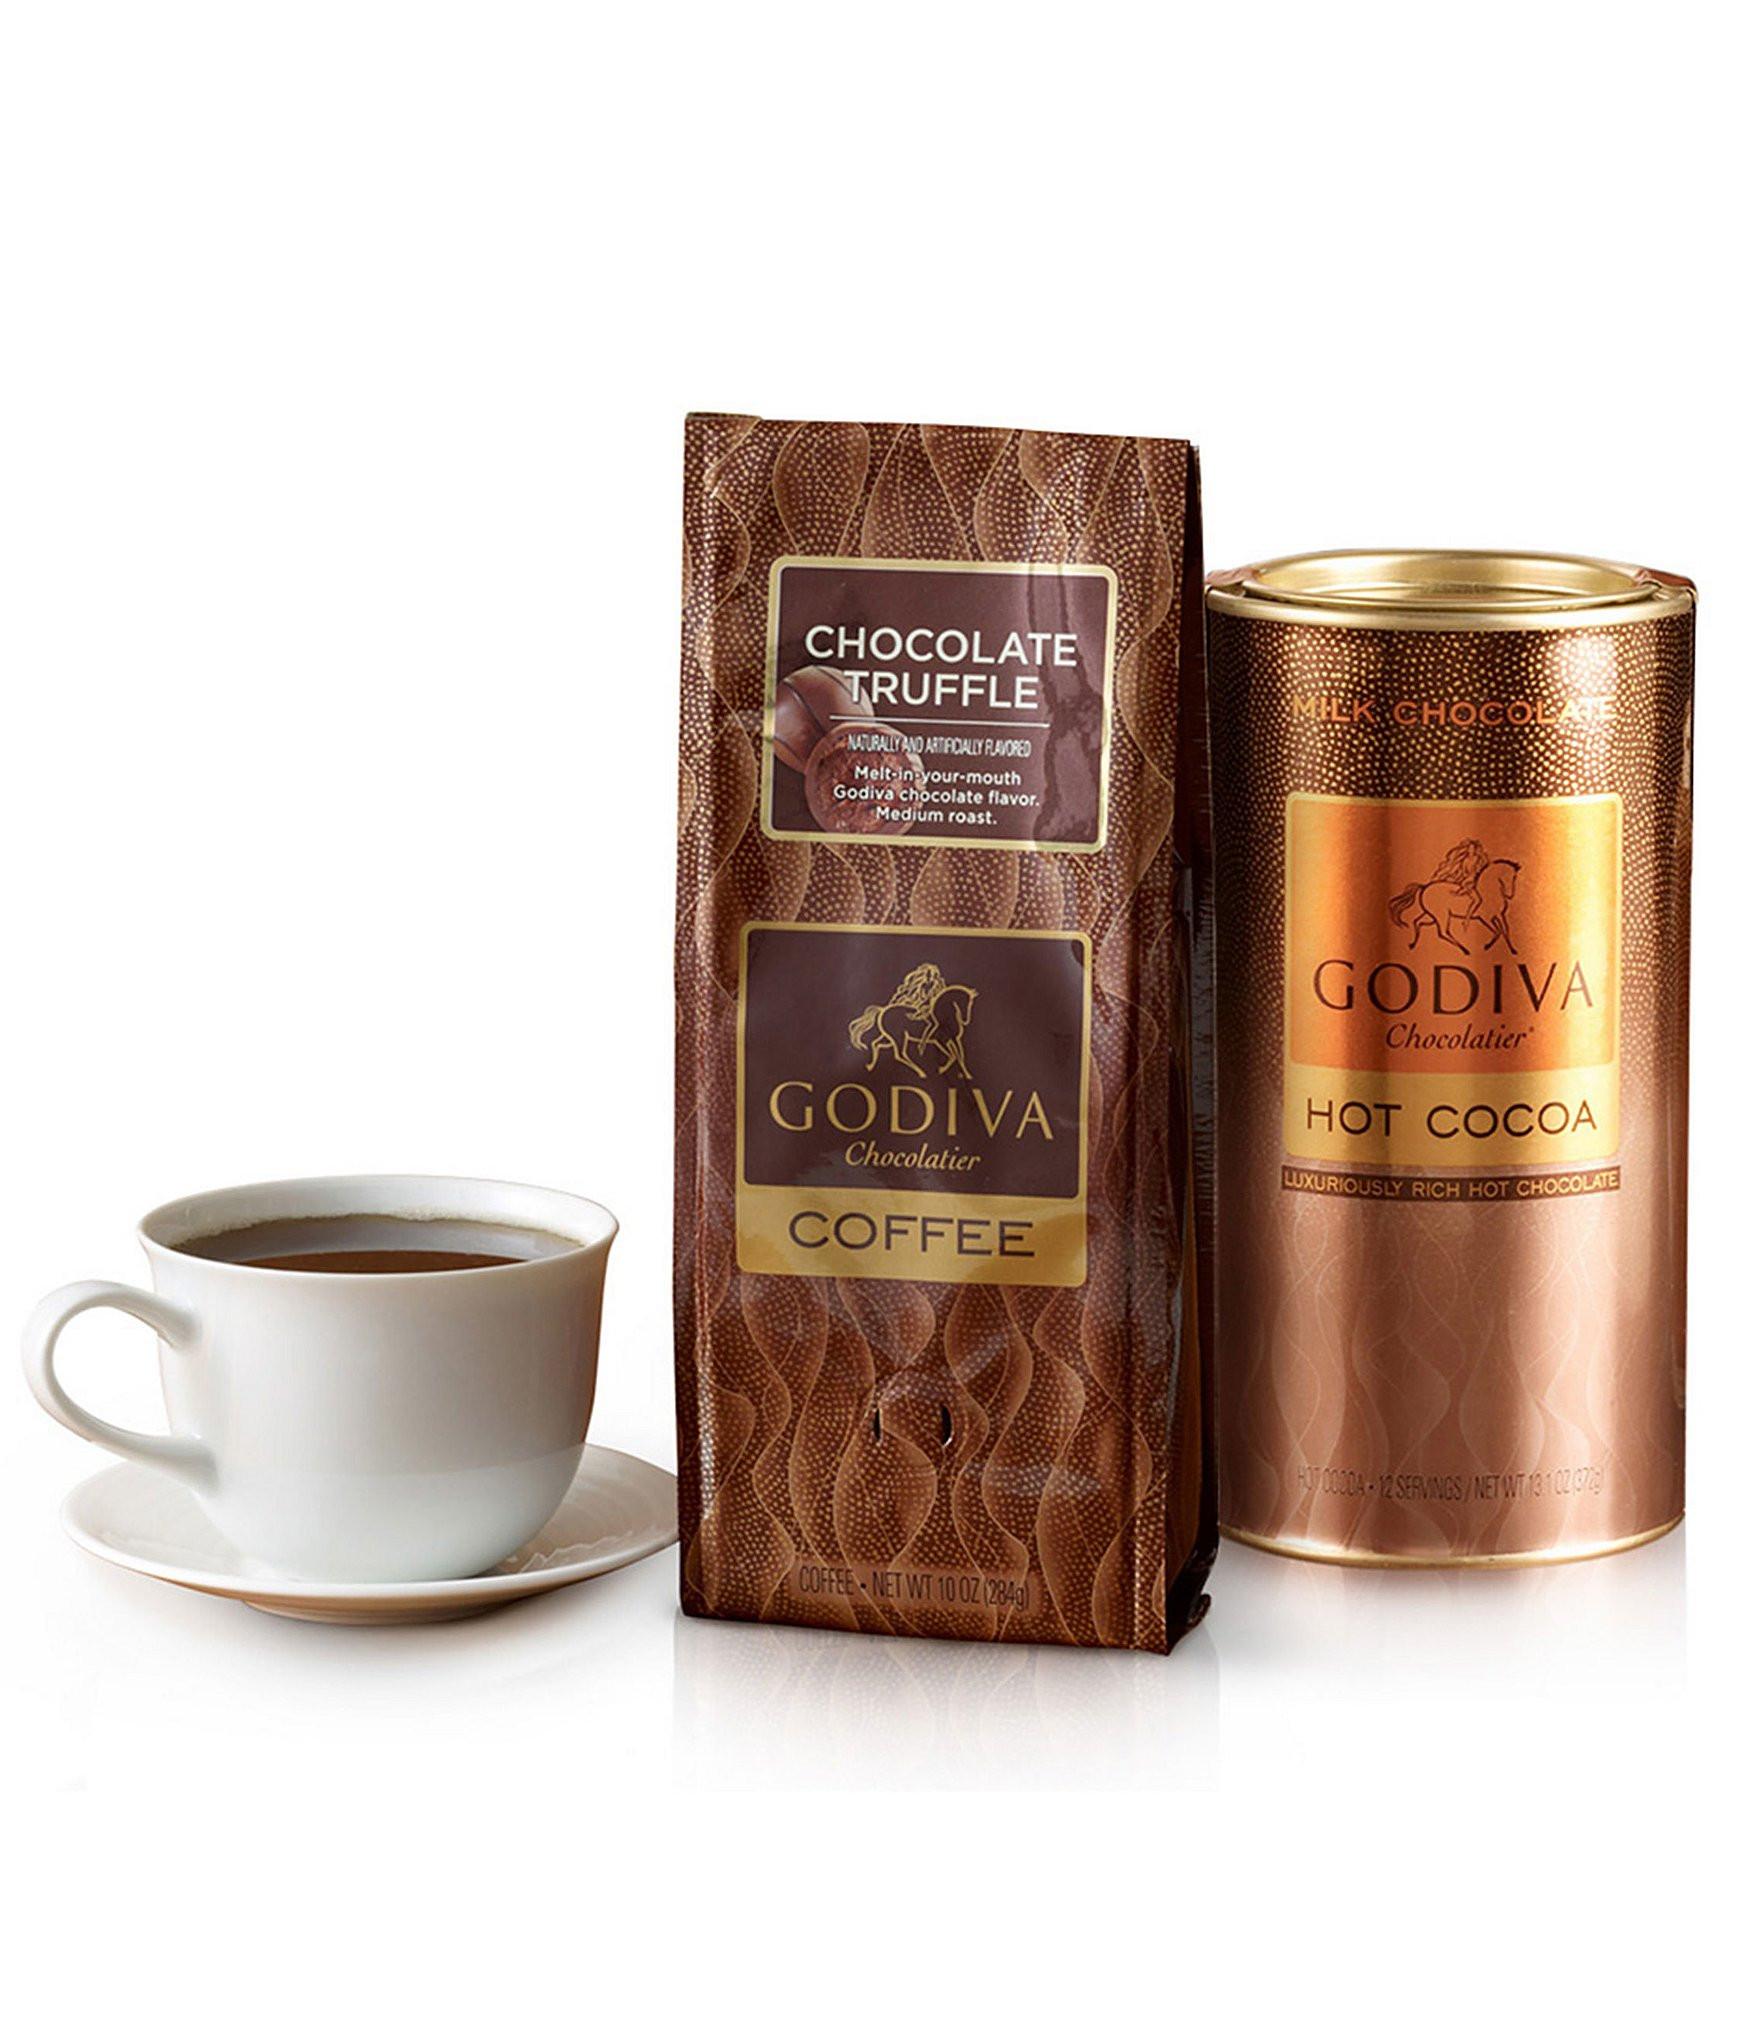 Godiva Hot Chocolate  Godiva Chocolatier Chocolate Coffee & Cocoa Gift Set